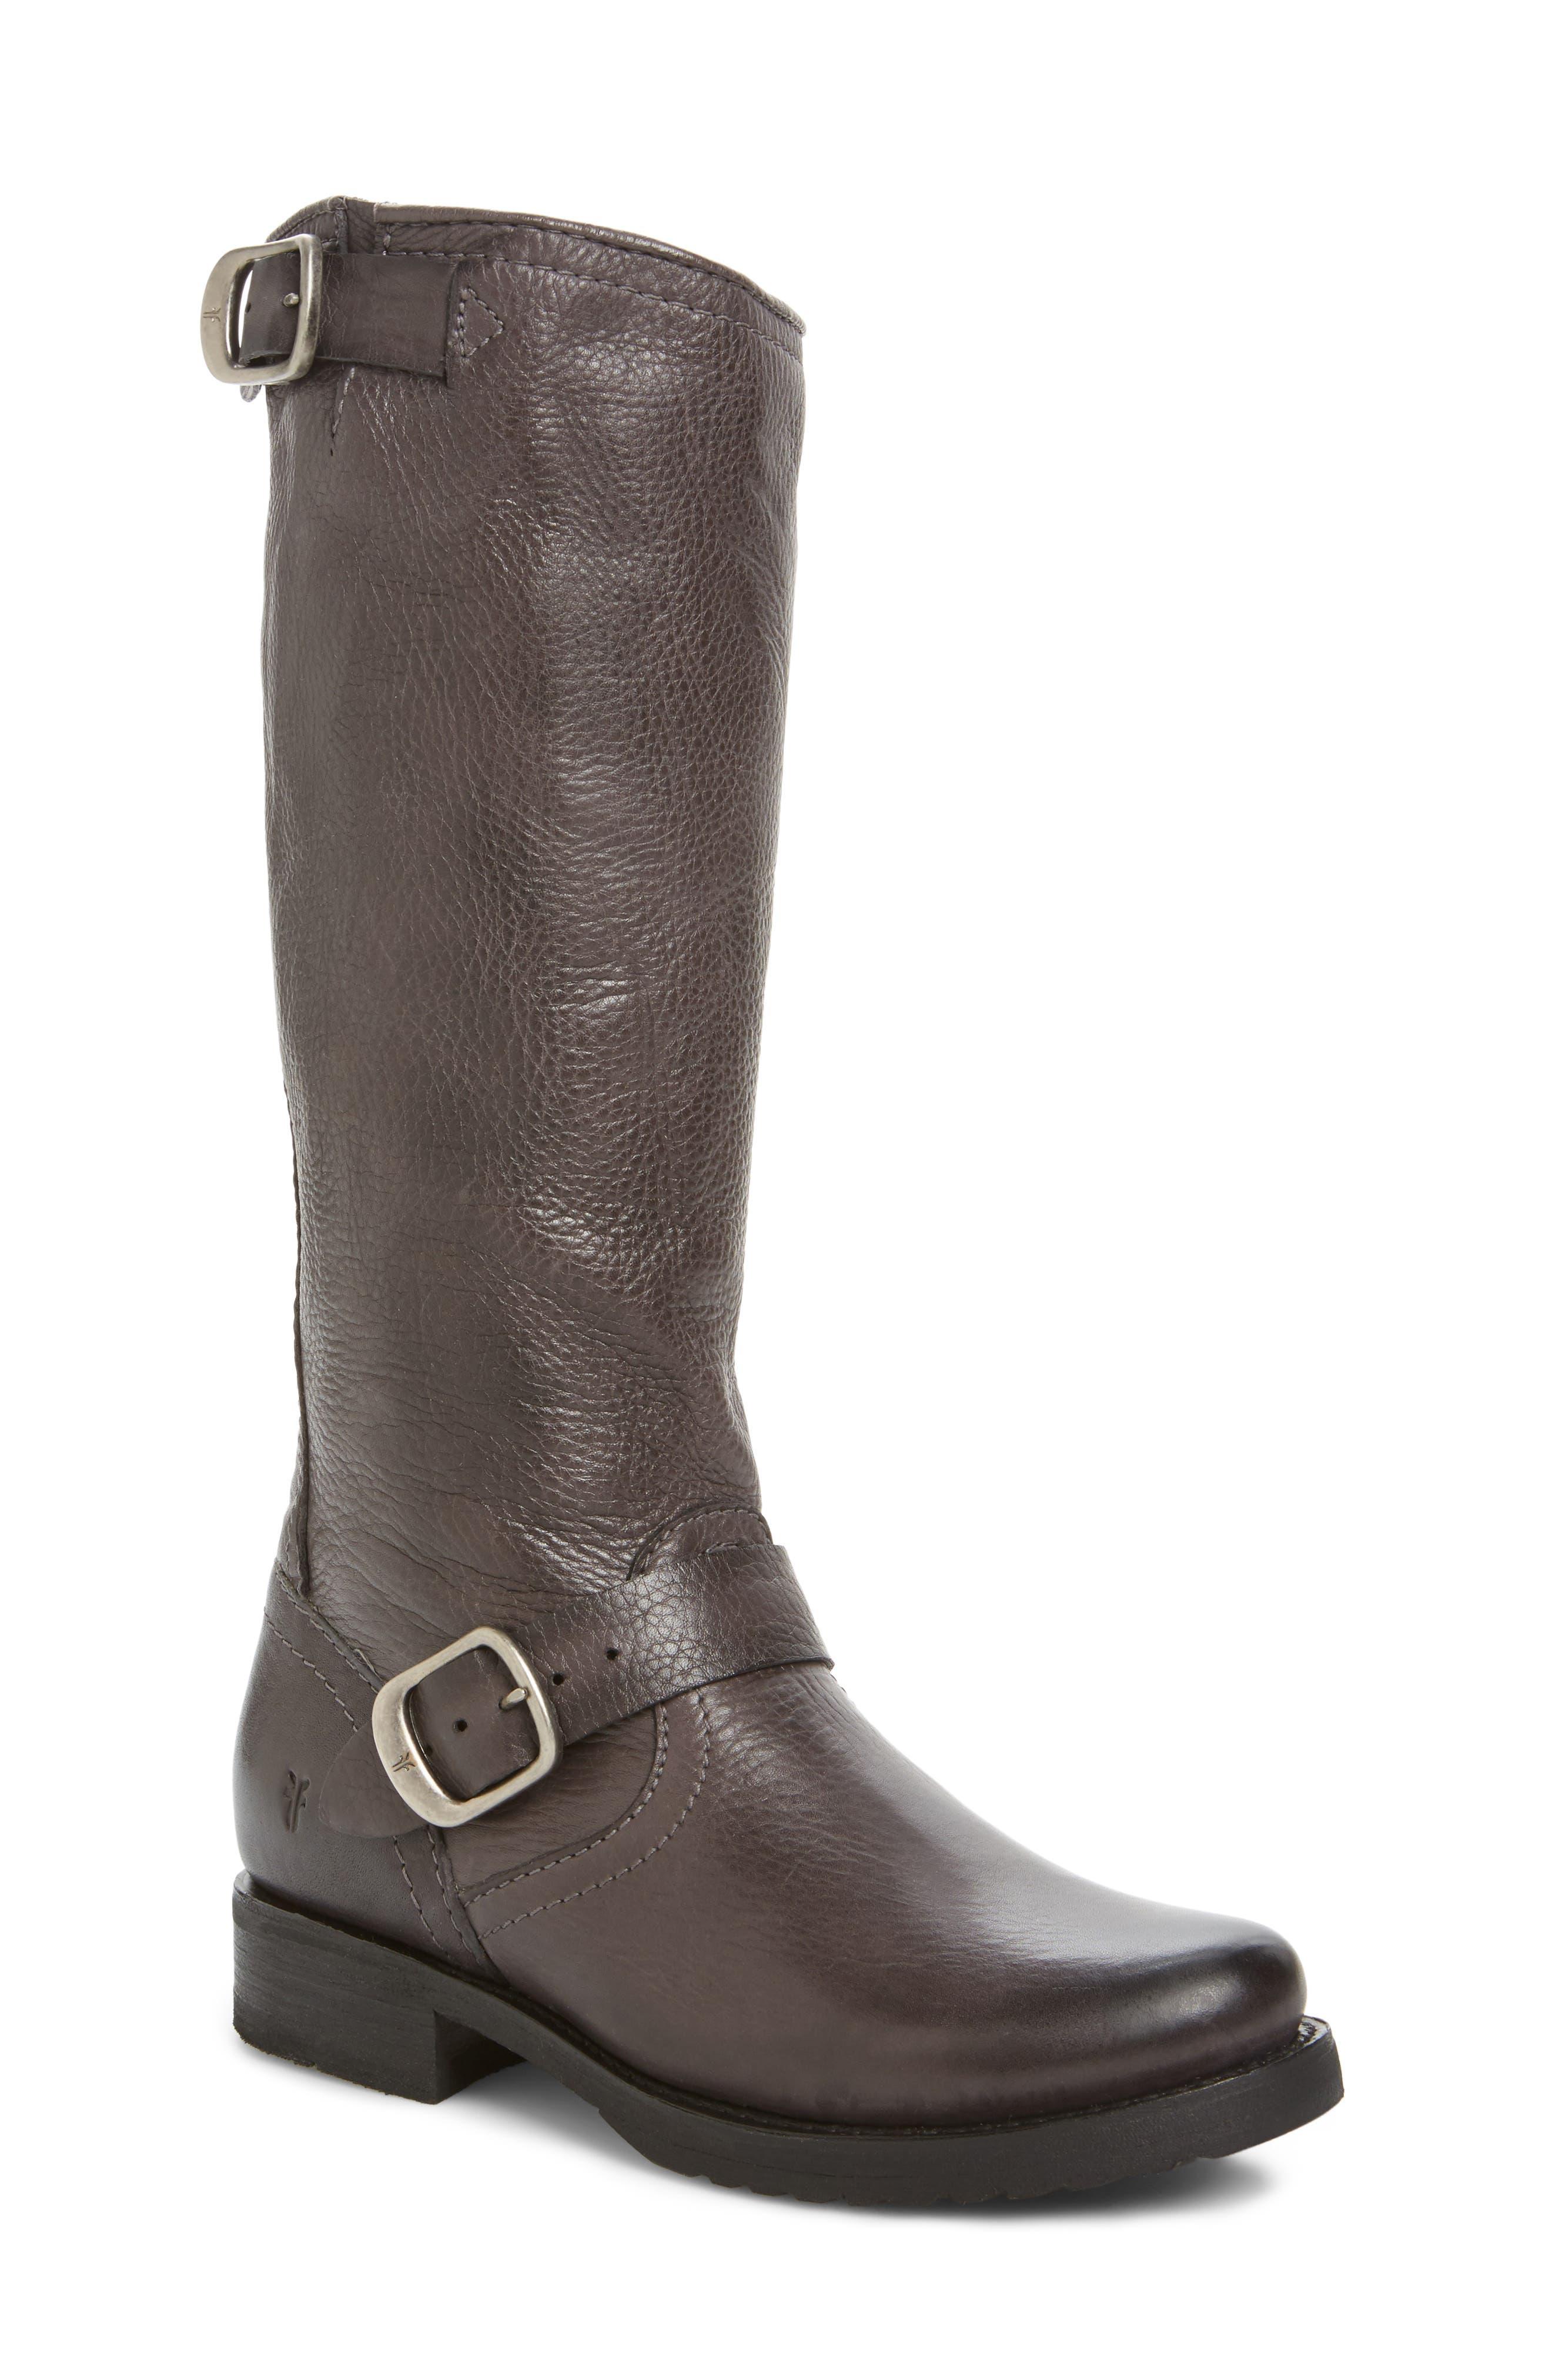 Alternate Image 1 Selected - Frye 'Veronica Slouch' Boot (Regular & Wide Calf) (Women)